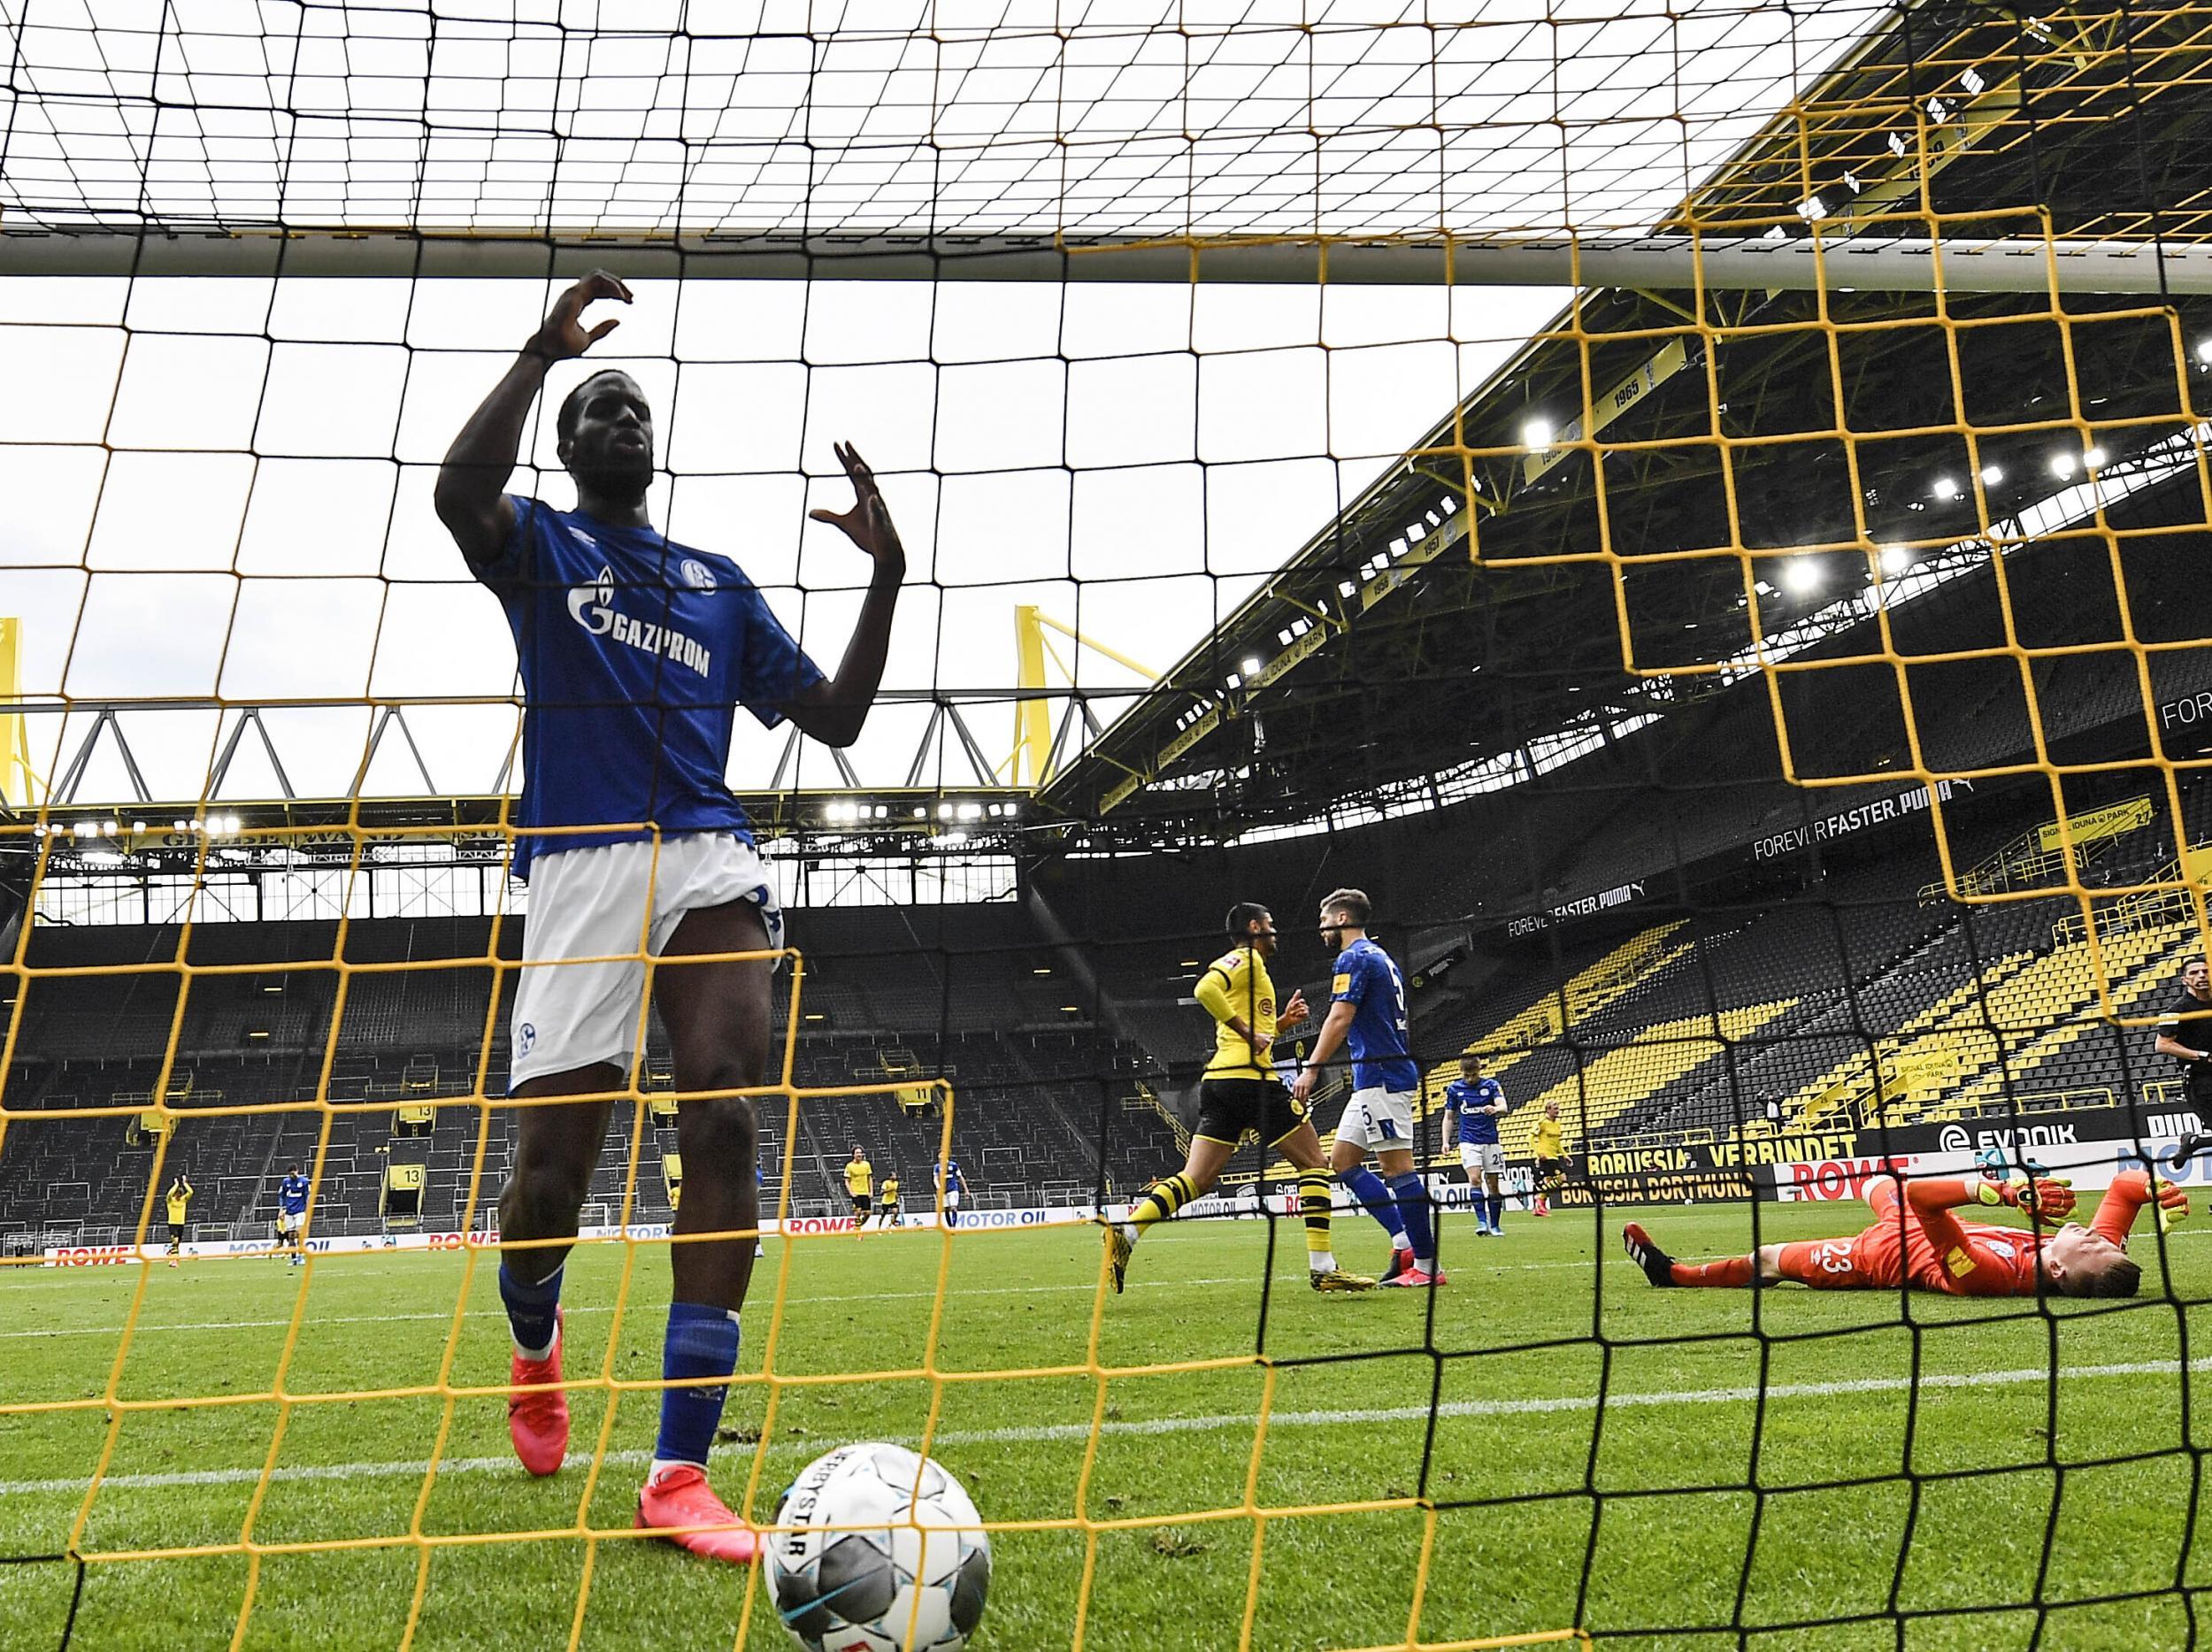 Wolfsburg vs Borussia Dortmund live stream: How to watch Bundesliga fixture online and on TV today